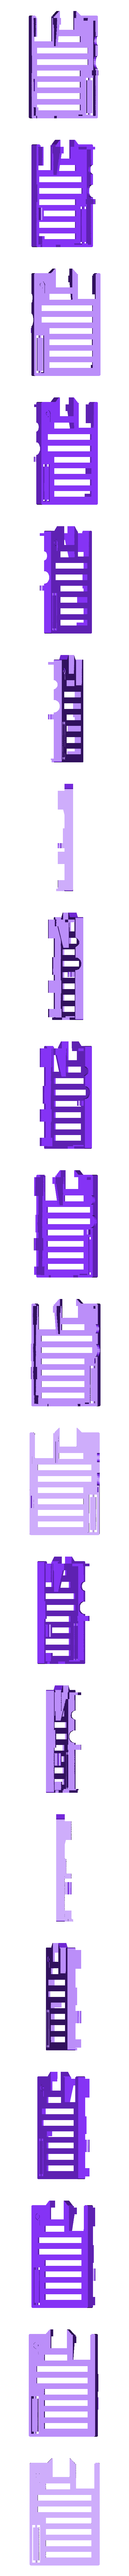 bbPi_CaseTop.stl Download free STL file badBrick - Case for Raspberry Pi. • 3D printable model, Lassaalk